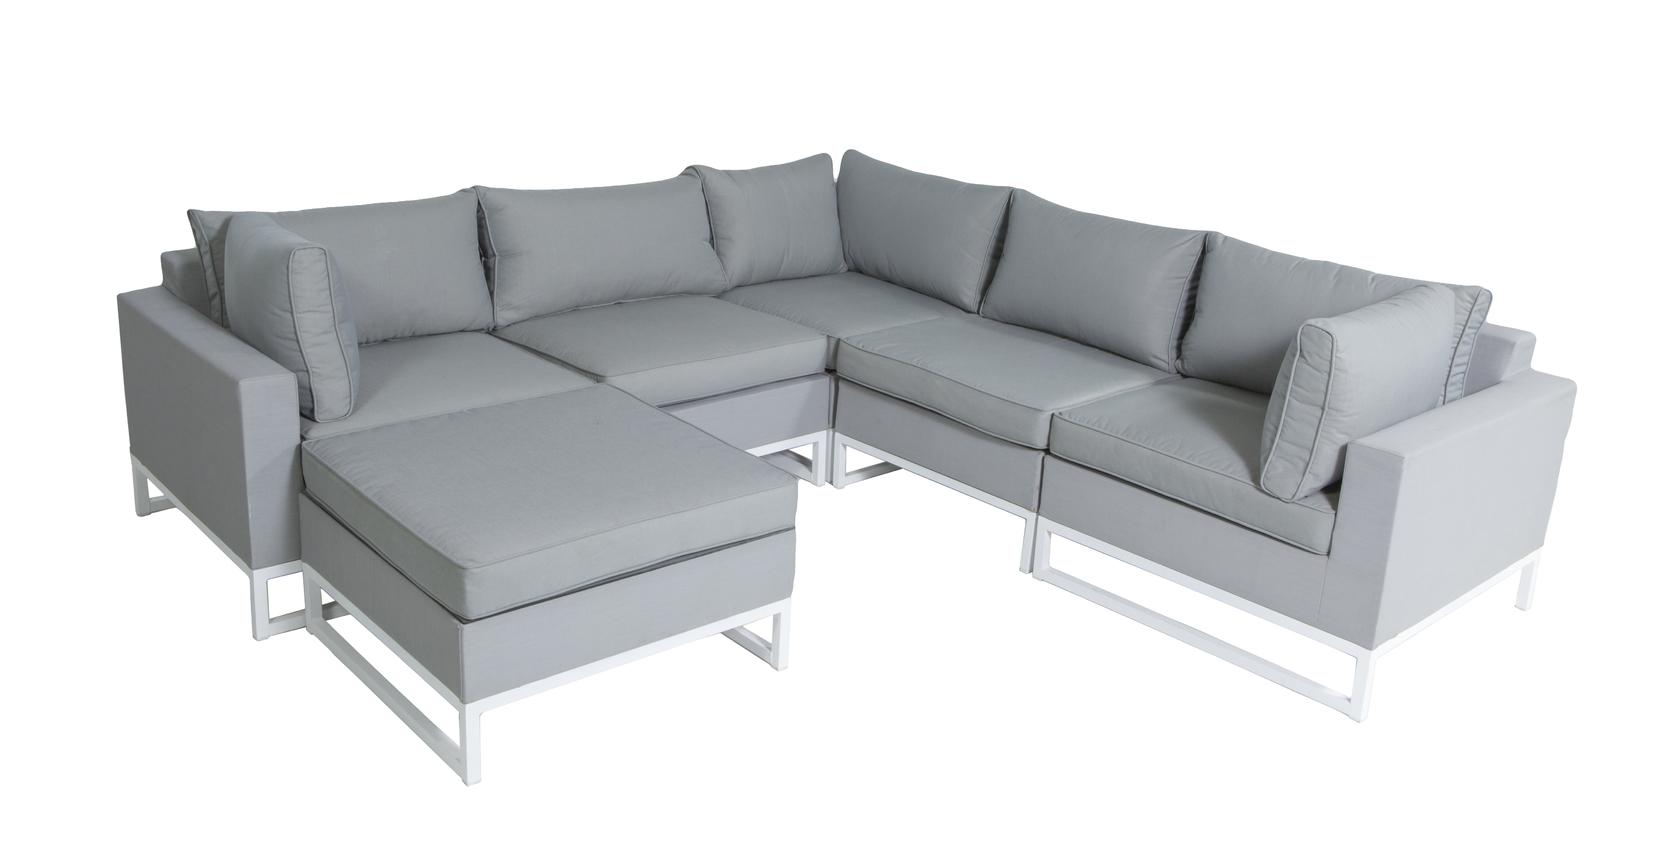 aluminium lounge sets teakstore teak tuinmeubelen zottegem oost vlaanderen teakstore. Black Bedroom Furniture Sets. Home Design Ideas